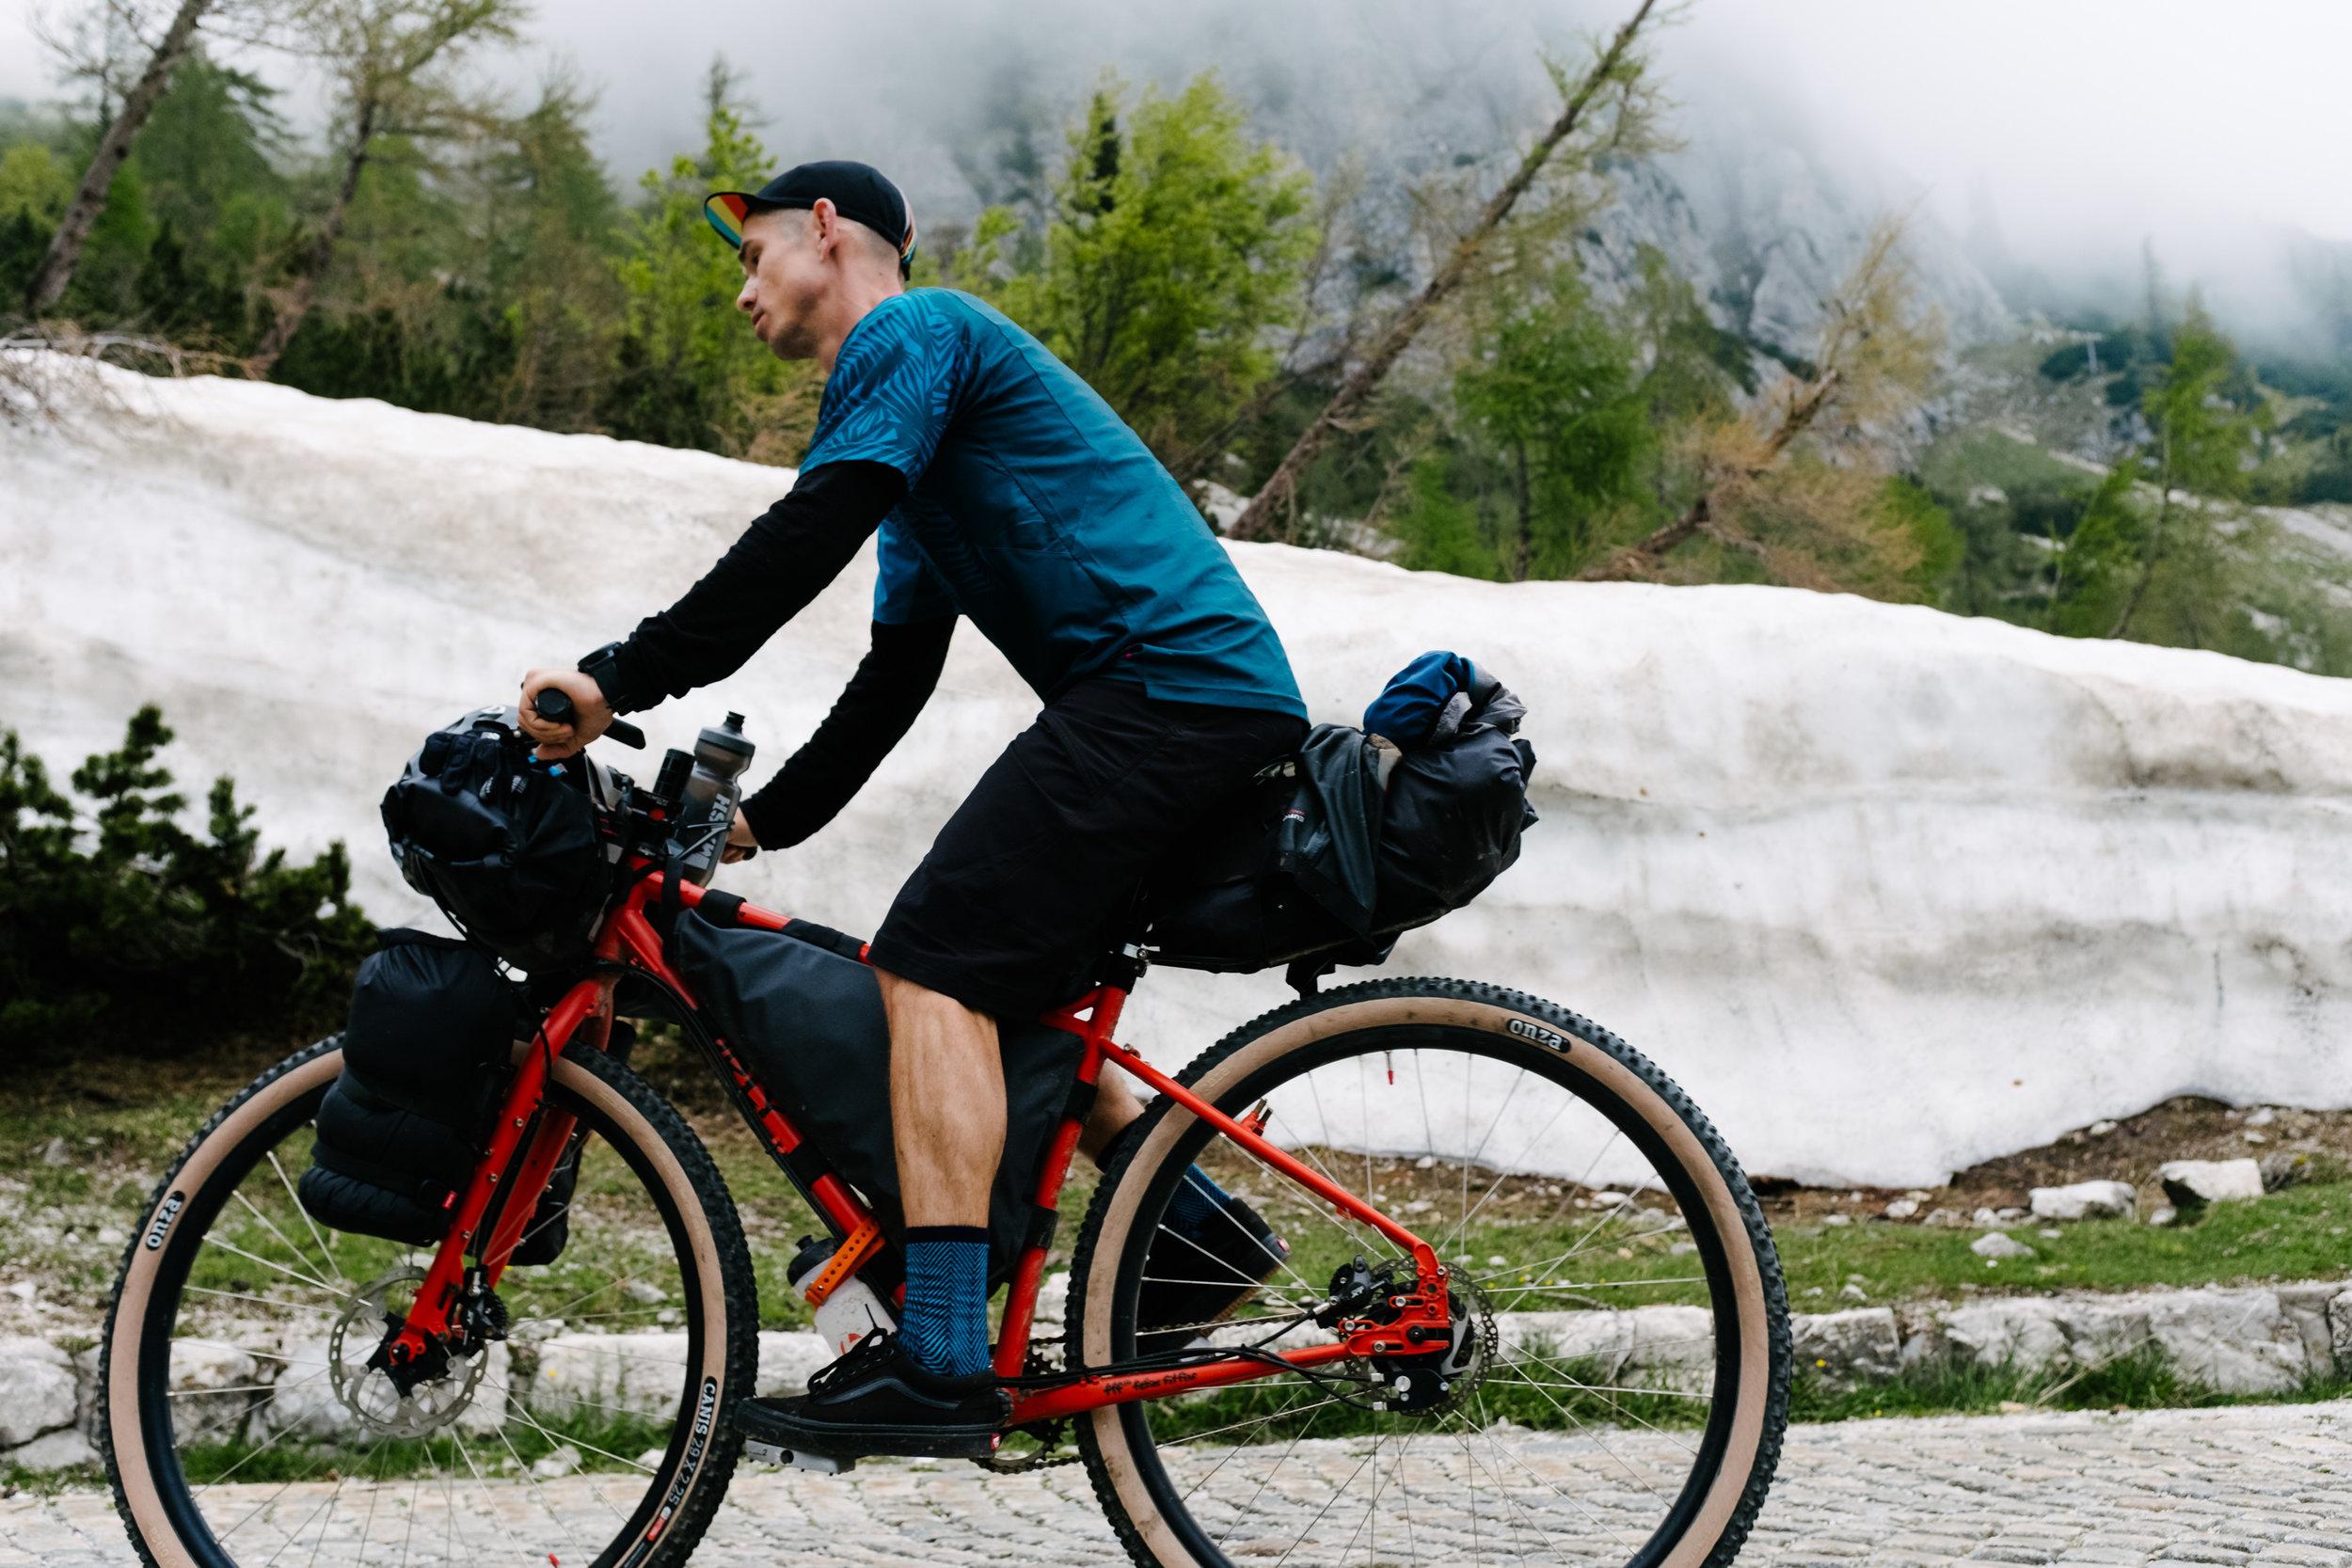 BenReadPhotography_Bikepacking-59.jpg